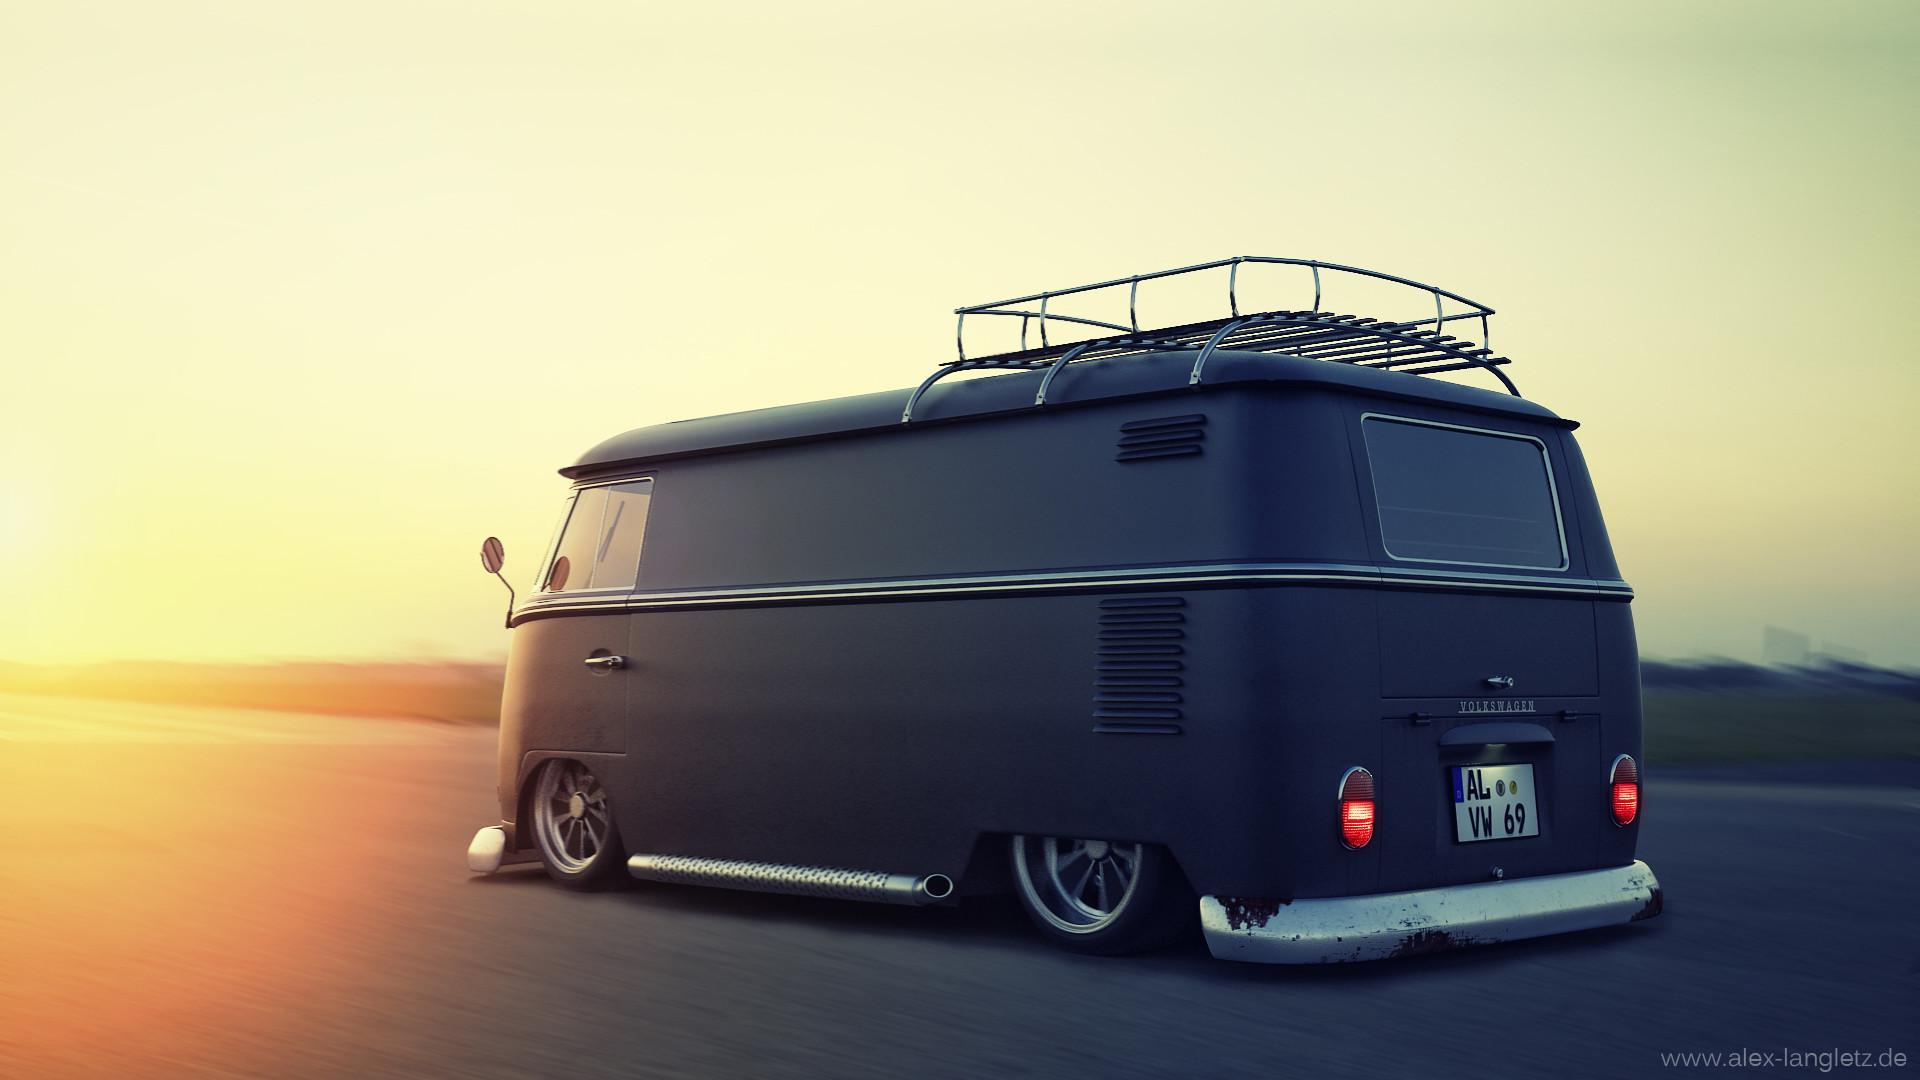 Alex langletz custom vw bus